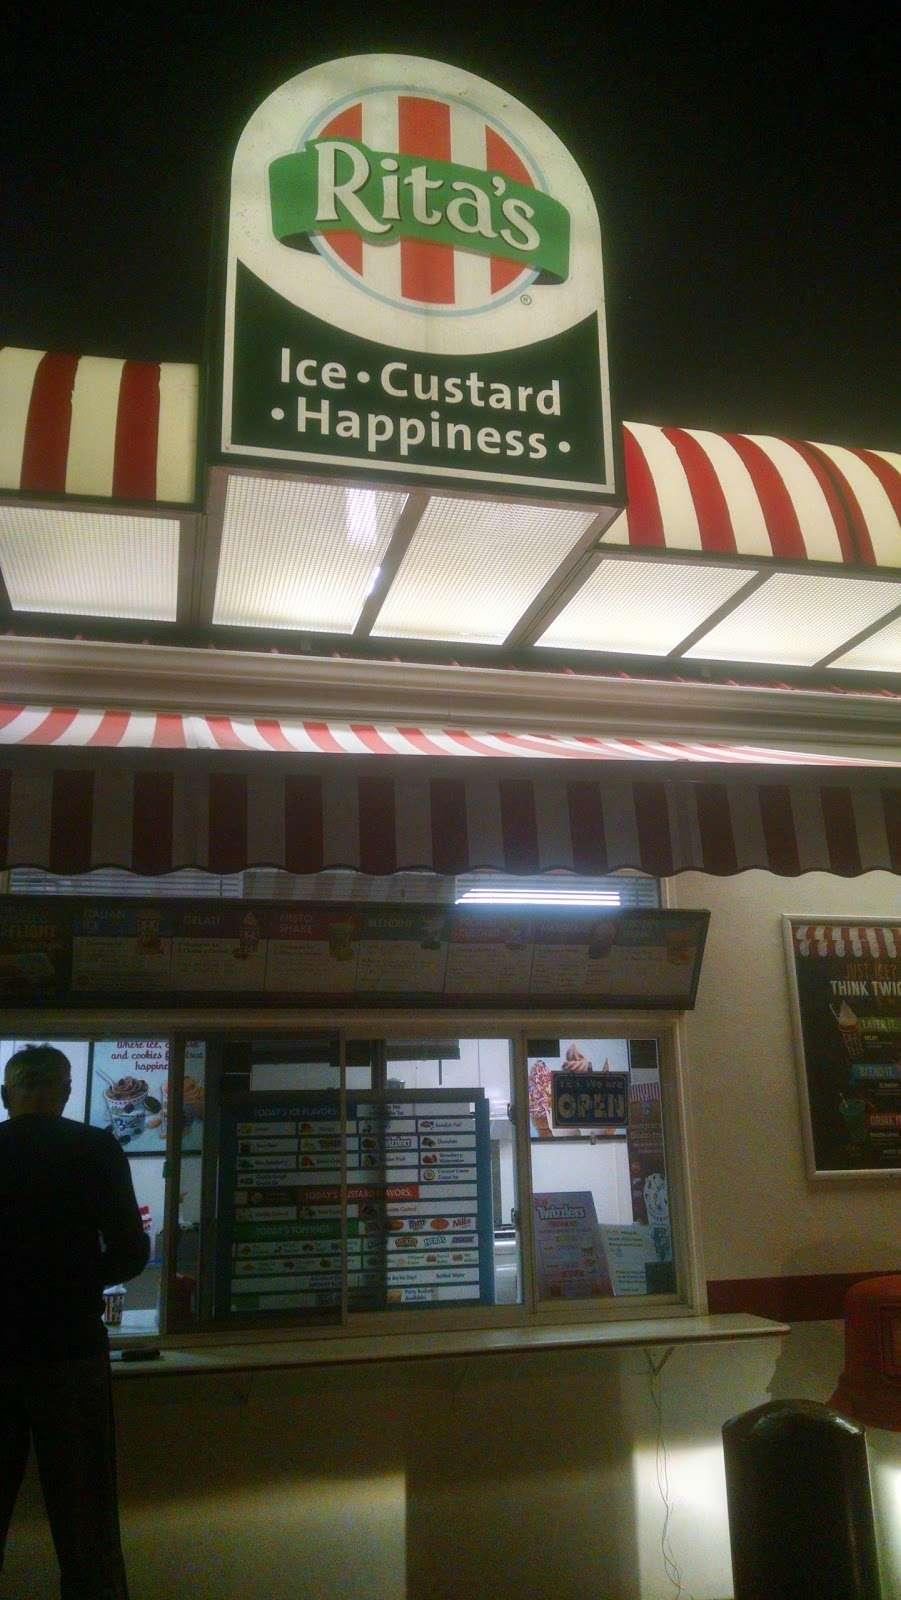 Ritas Italian Ice - store    Photo 10 of 10   Address: 50 River Rd, North Arlington, NJ 07031, USA   Phone: (201) 428-1356